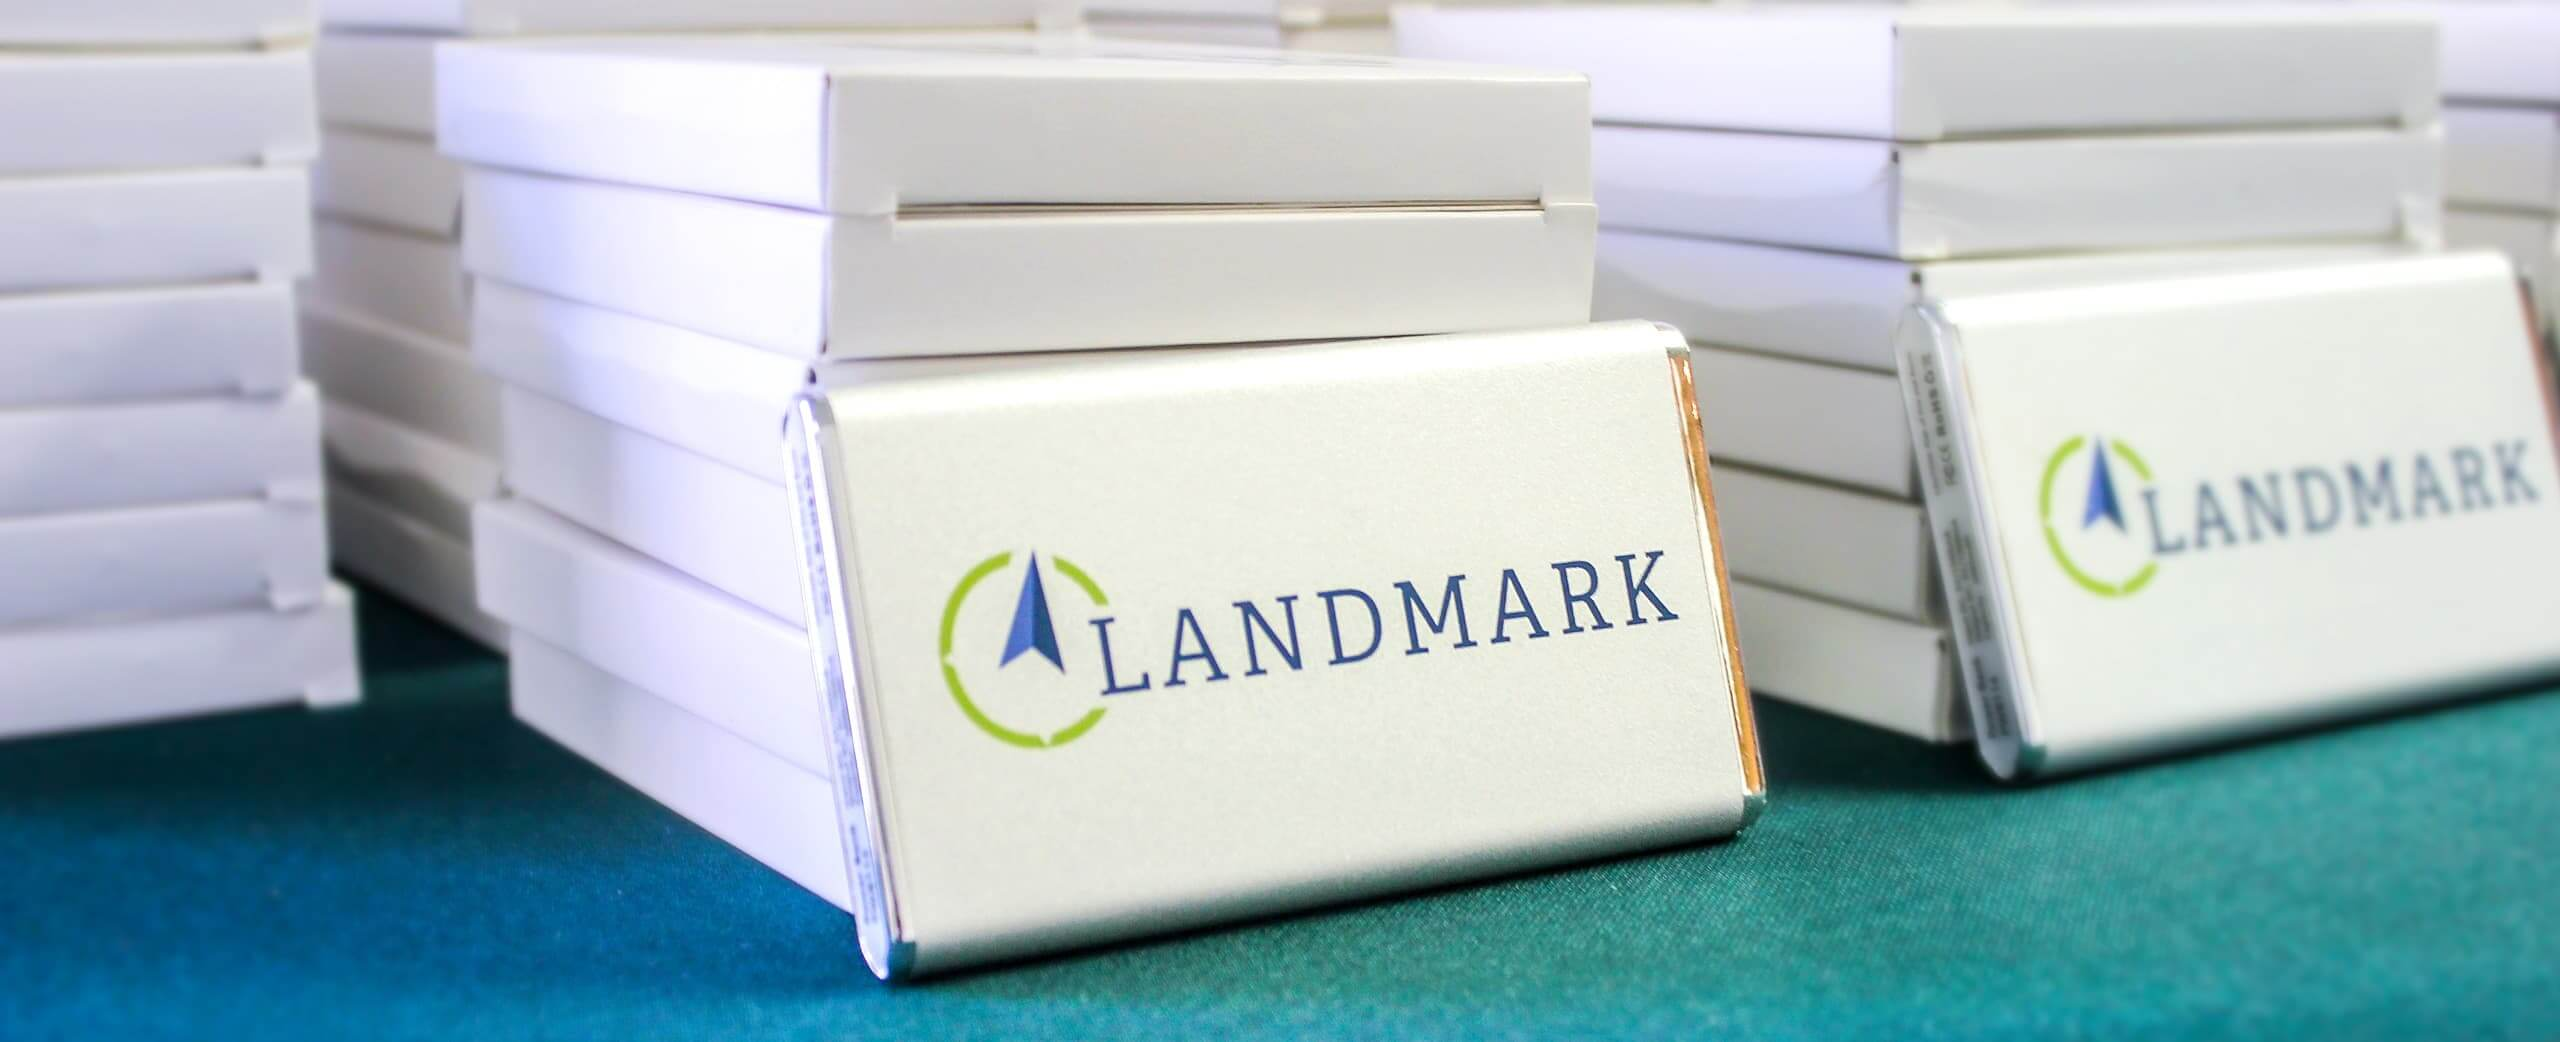 Landmark_powerbanks